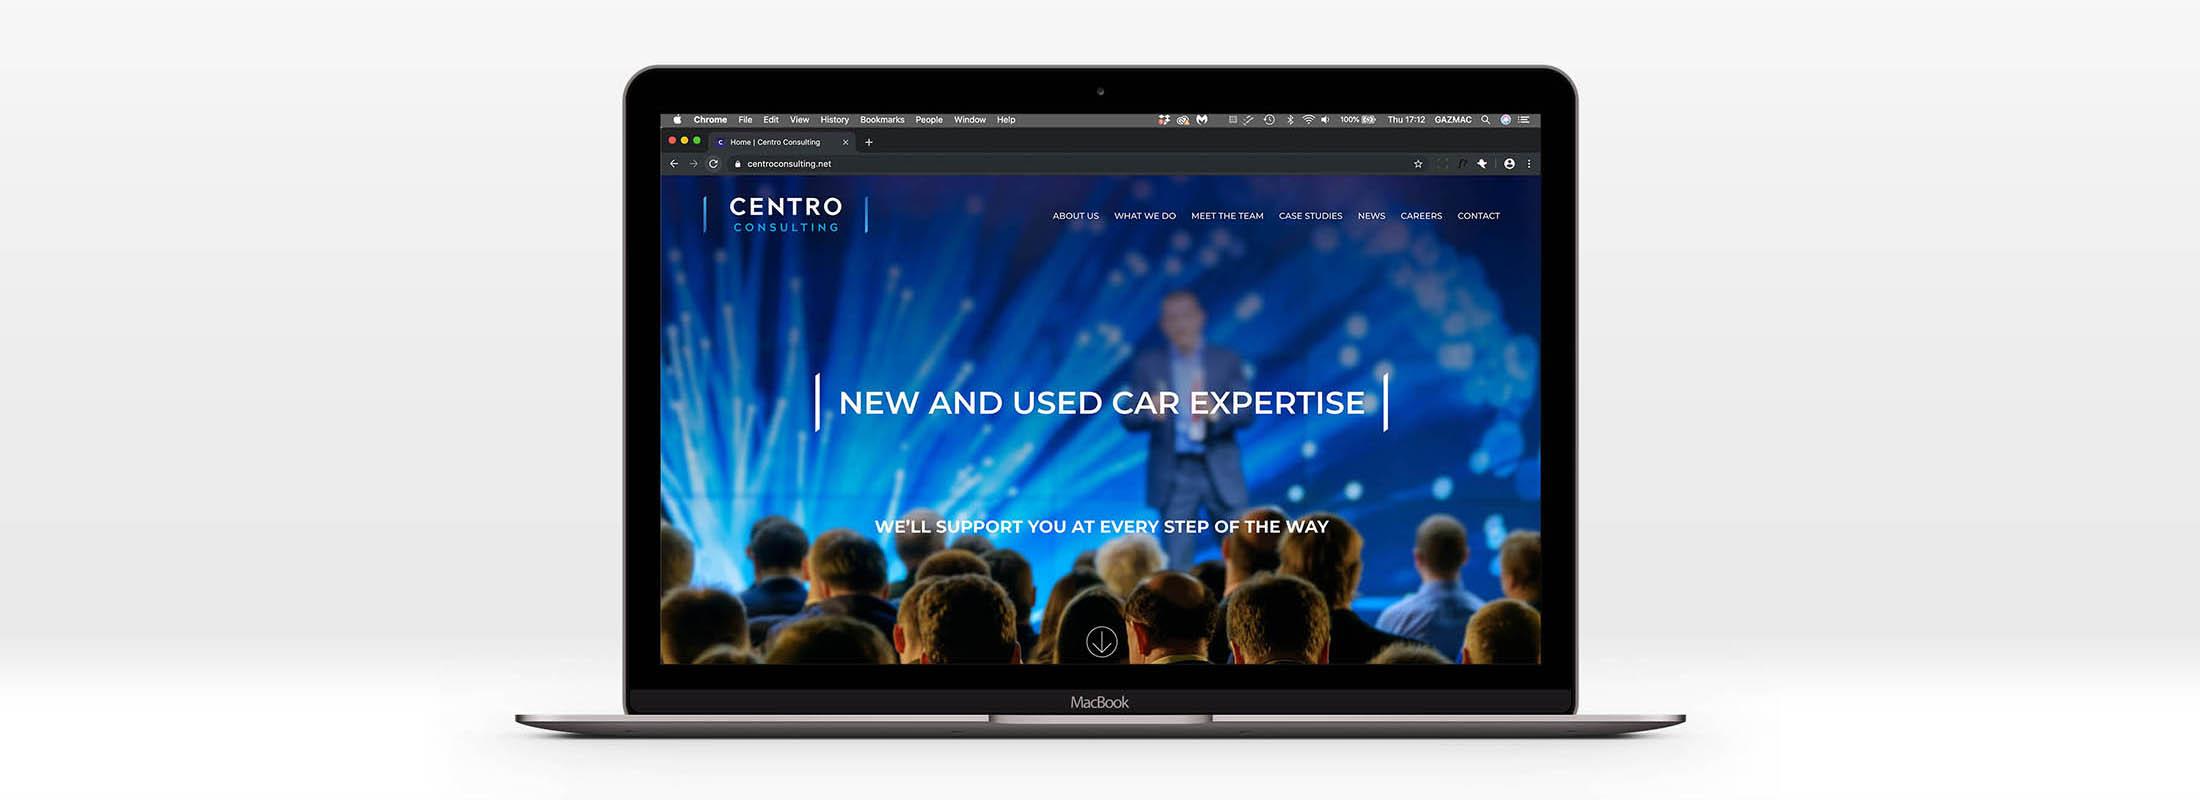 Centro consulting website identity rebrand